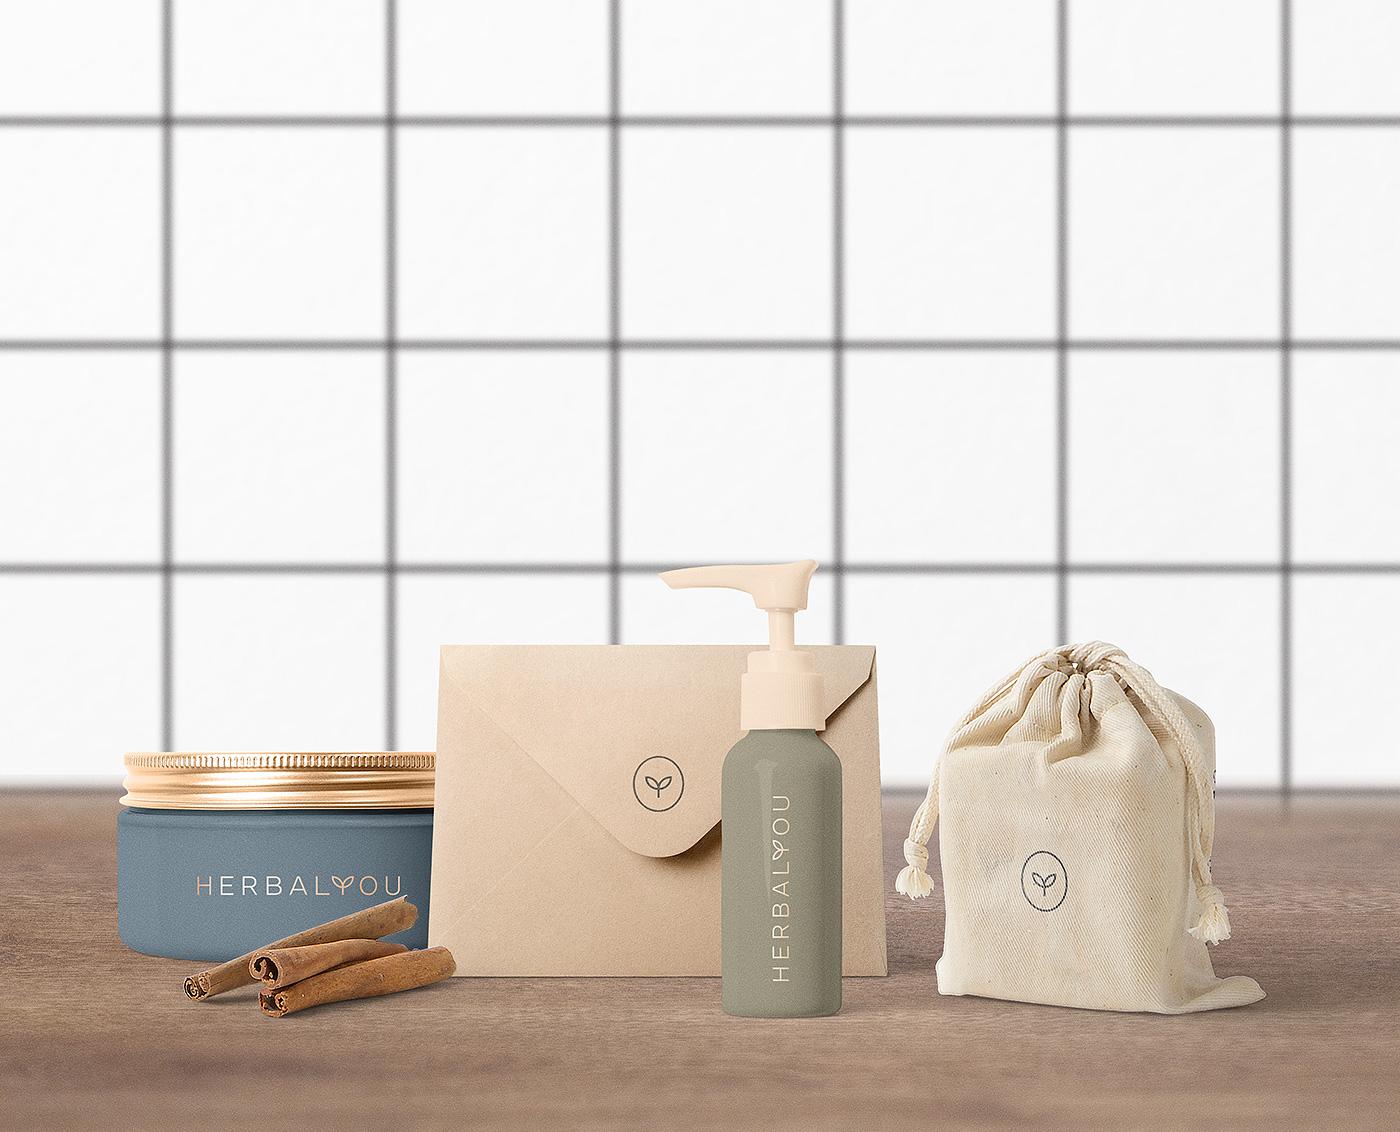 herbalyou-company-brand-03.jpg